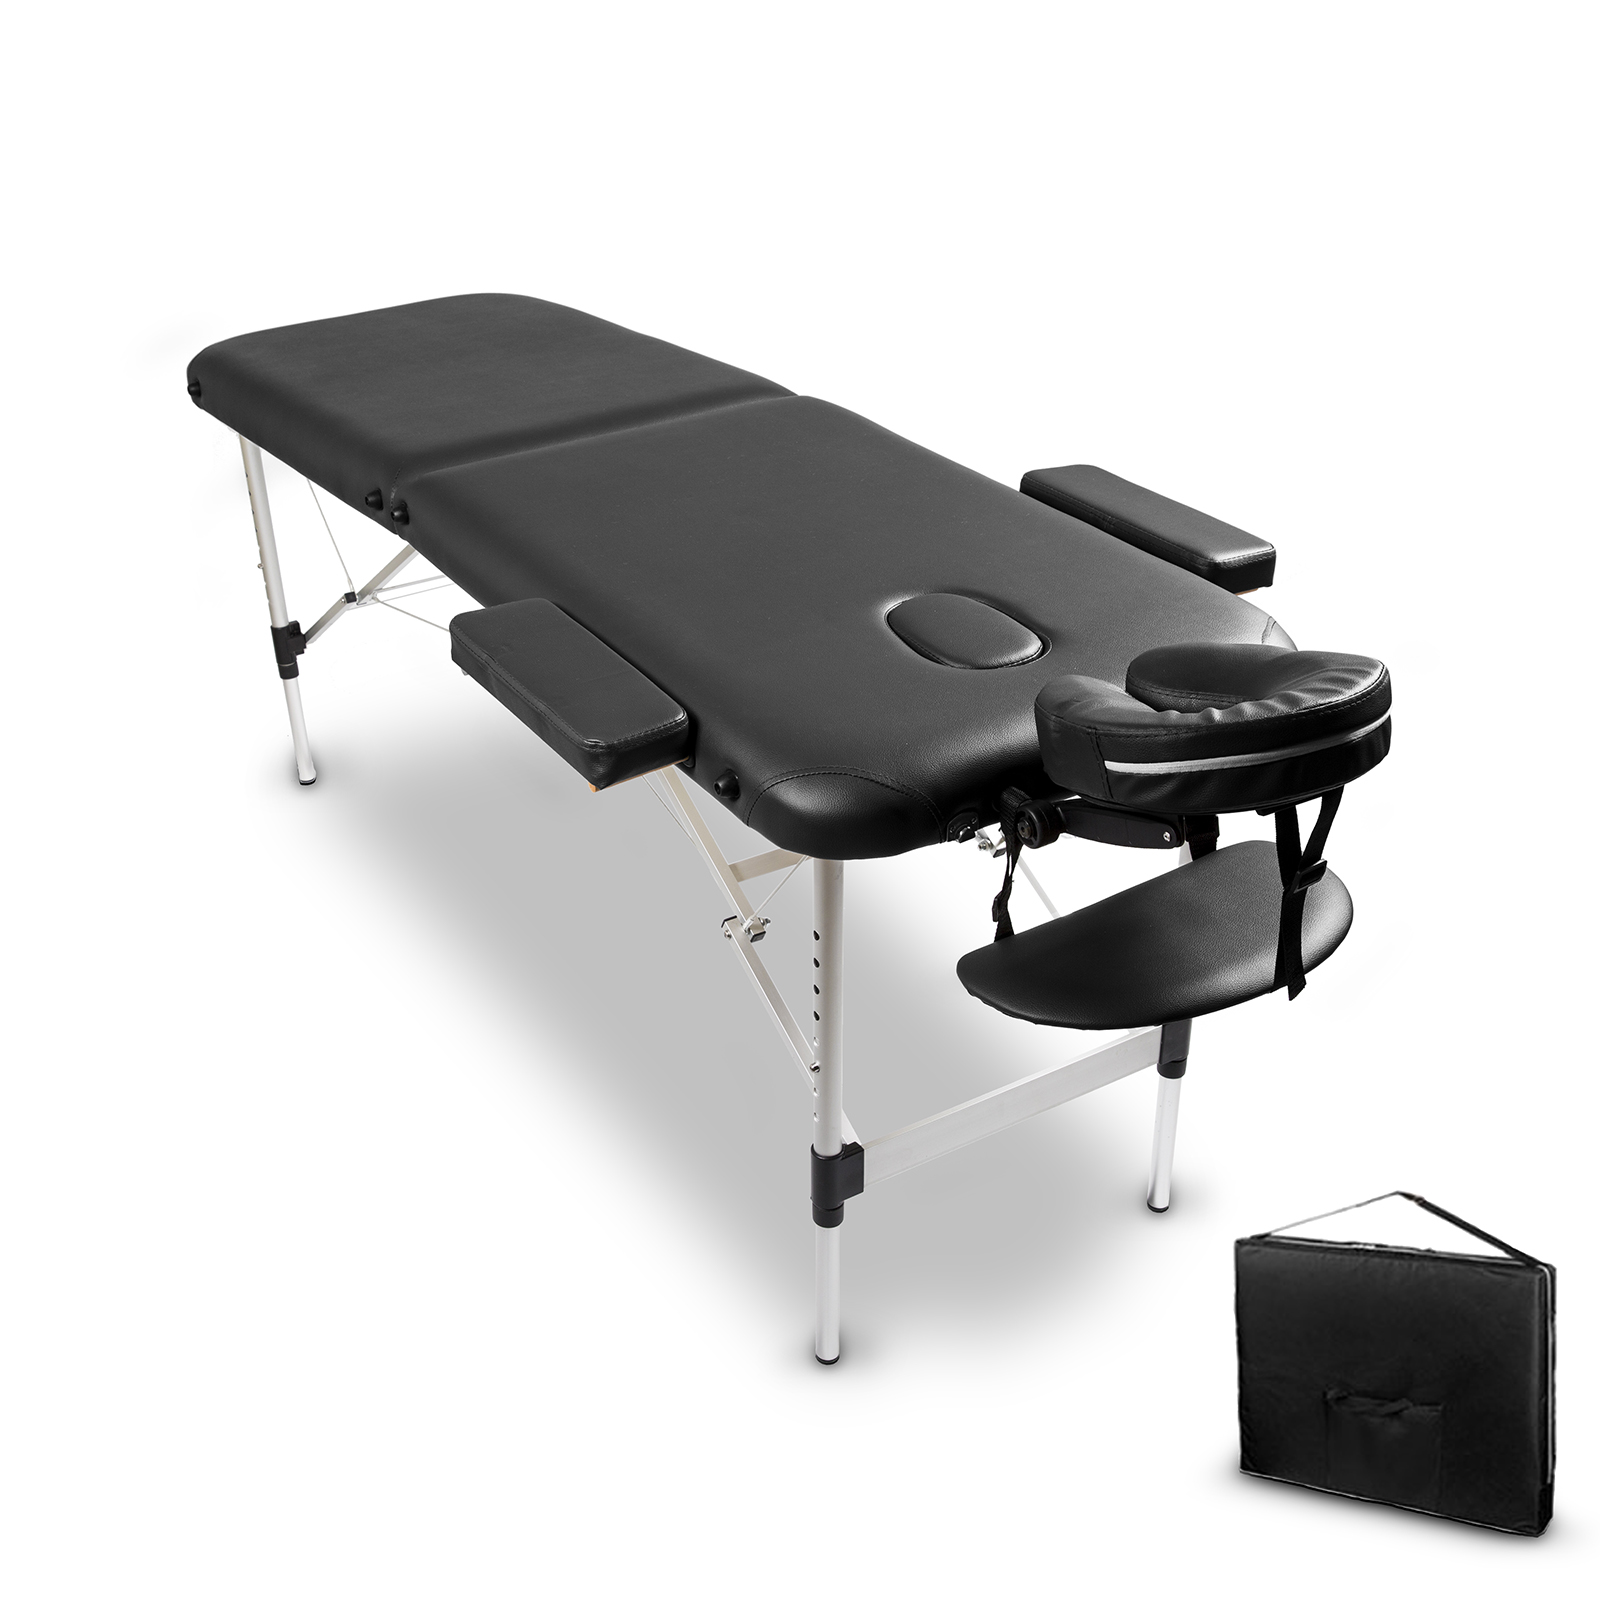 Bærbar Aluminium 2 Fold Massage Bord Bed Stollegeme-7615